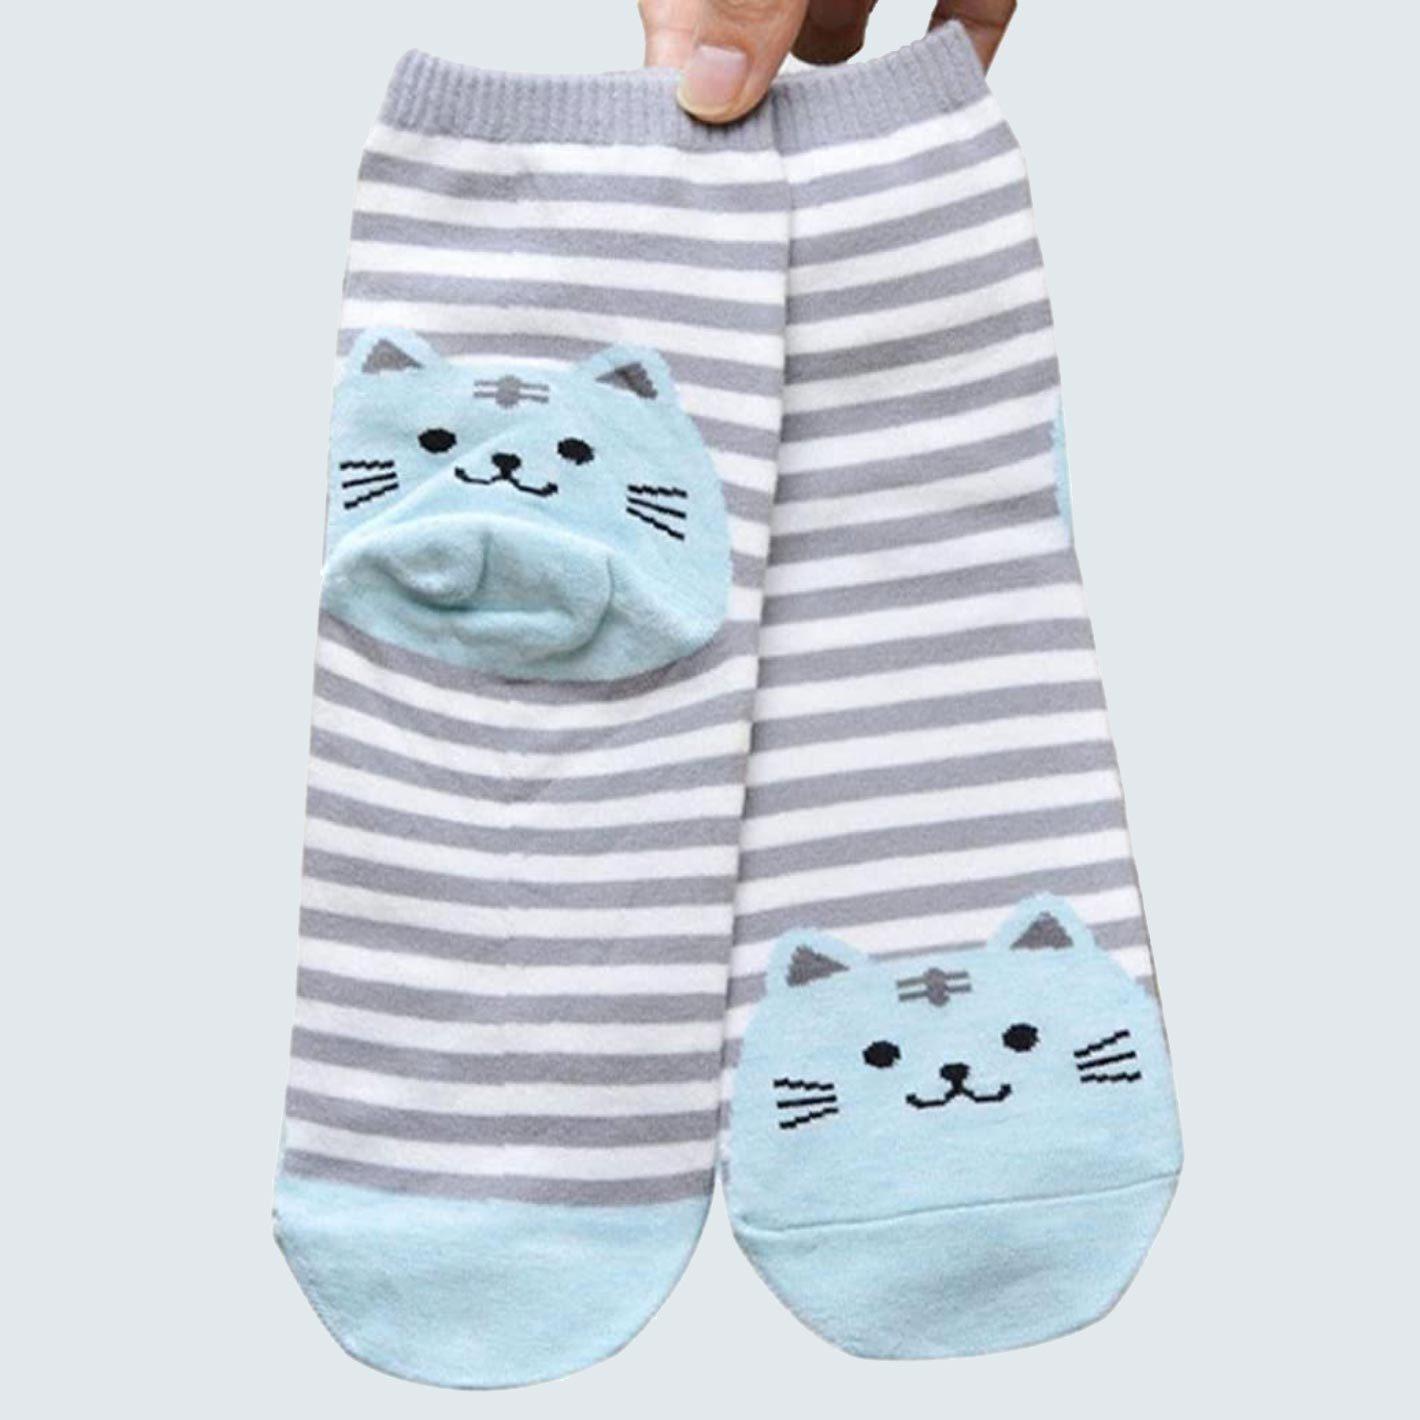 cozy cat socks